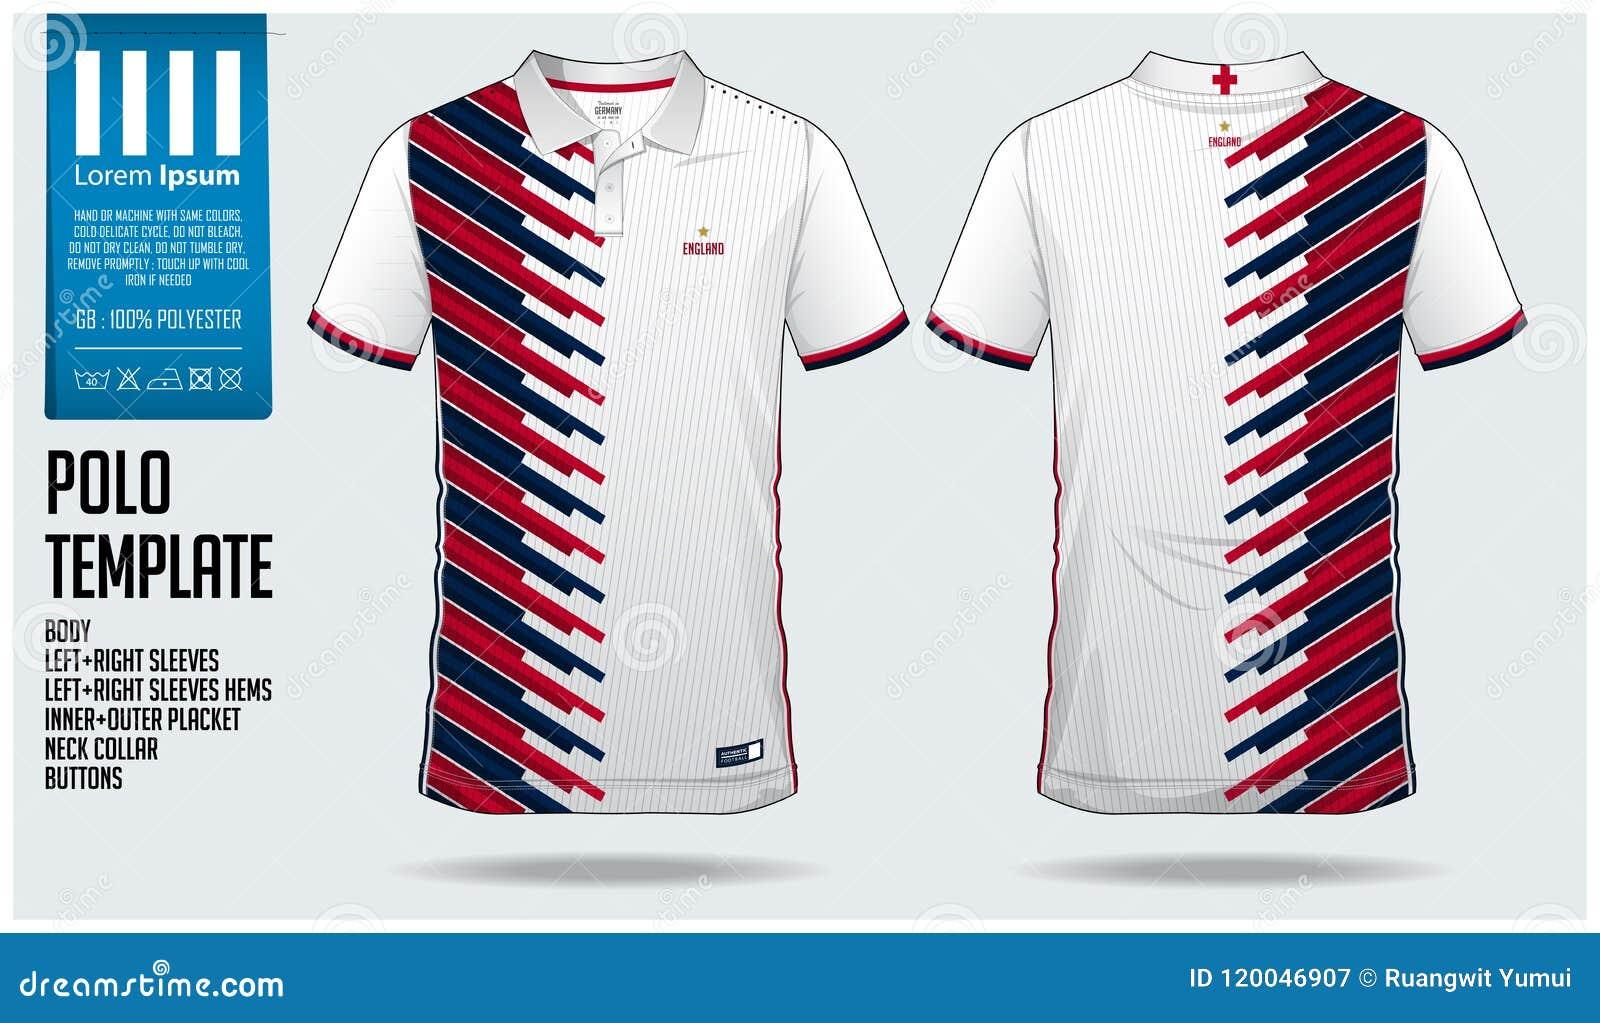 0feb008d5 England Team Polo T-shirt Sport Template Design For Soccer Jersey ...